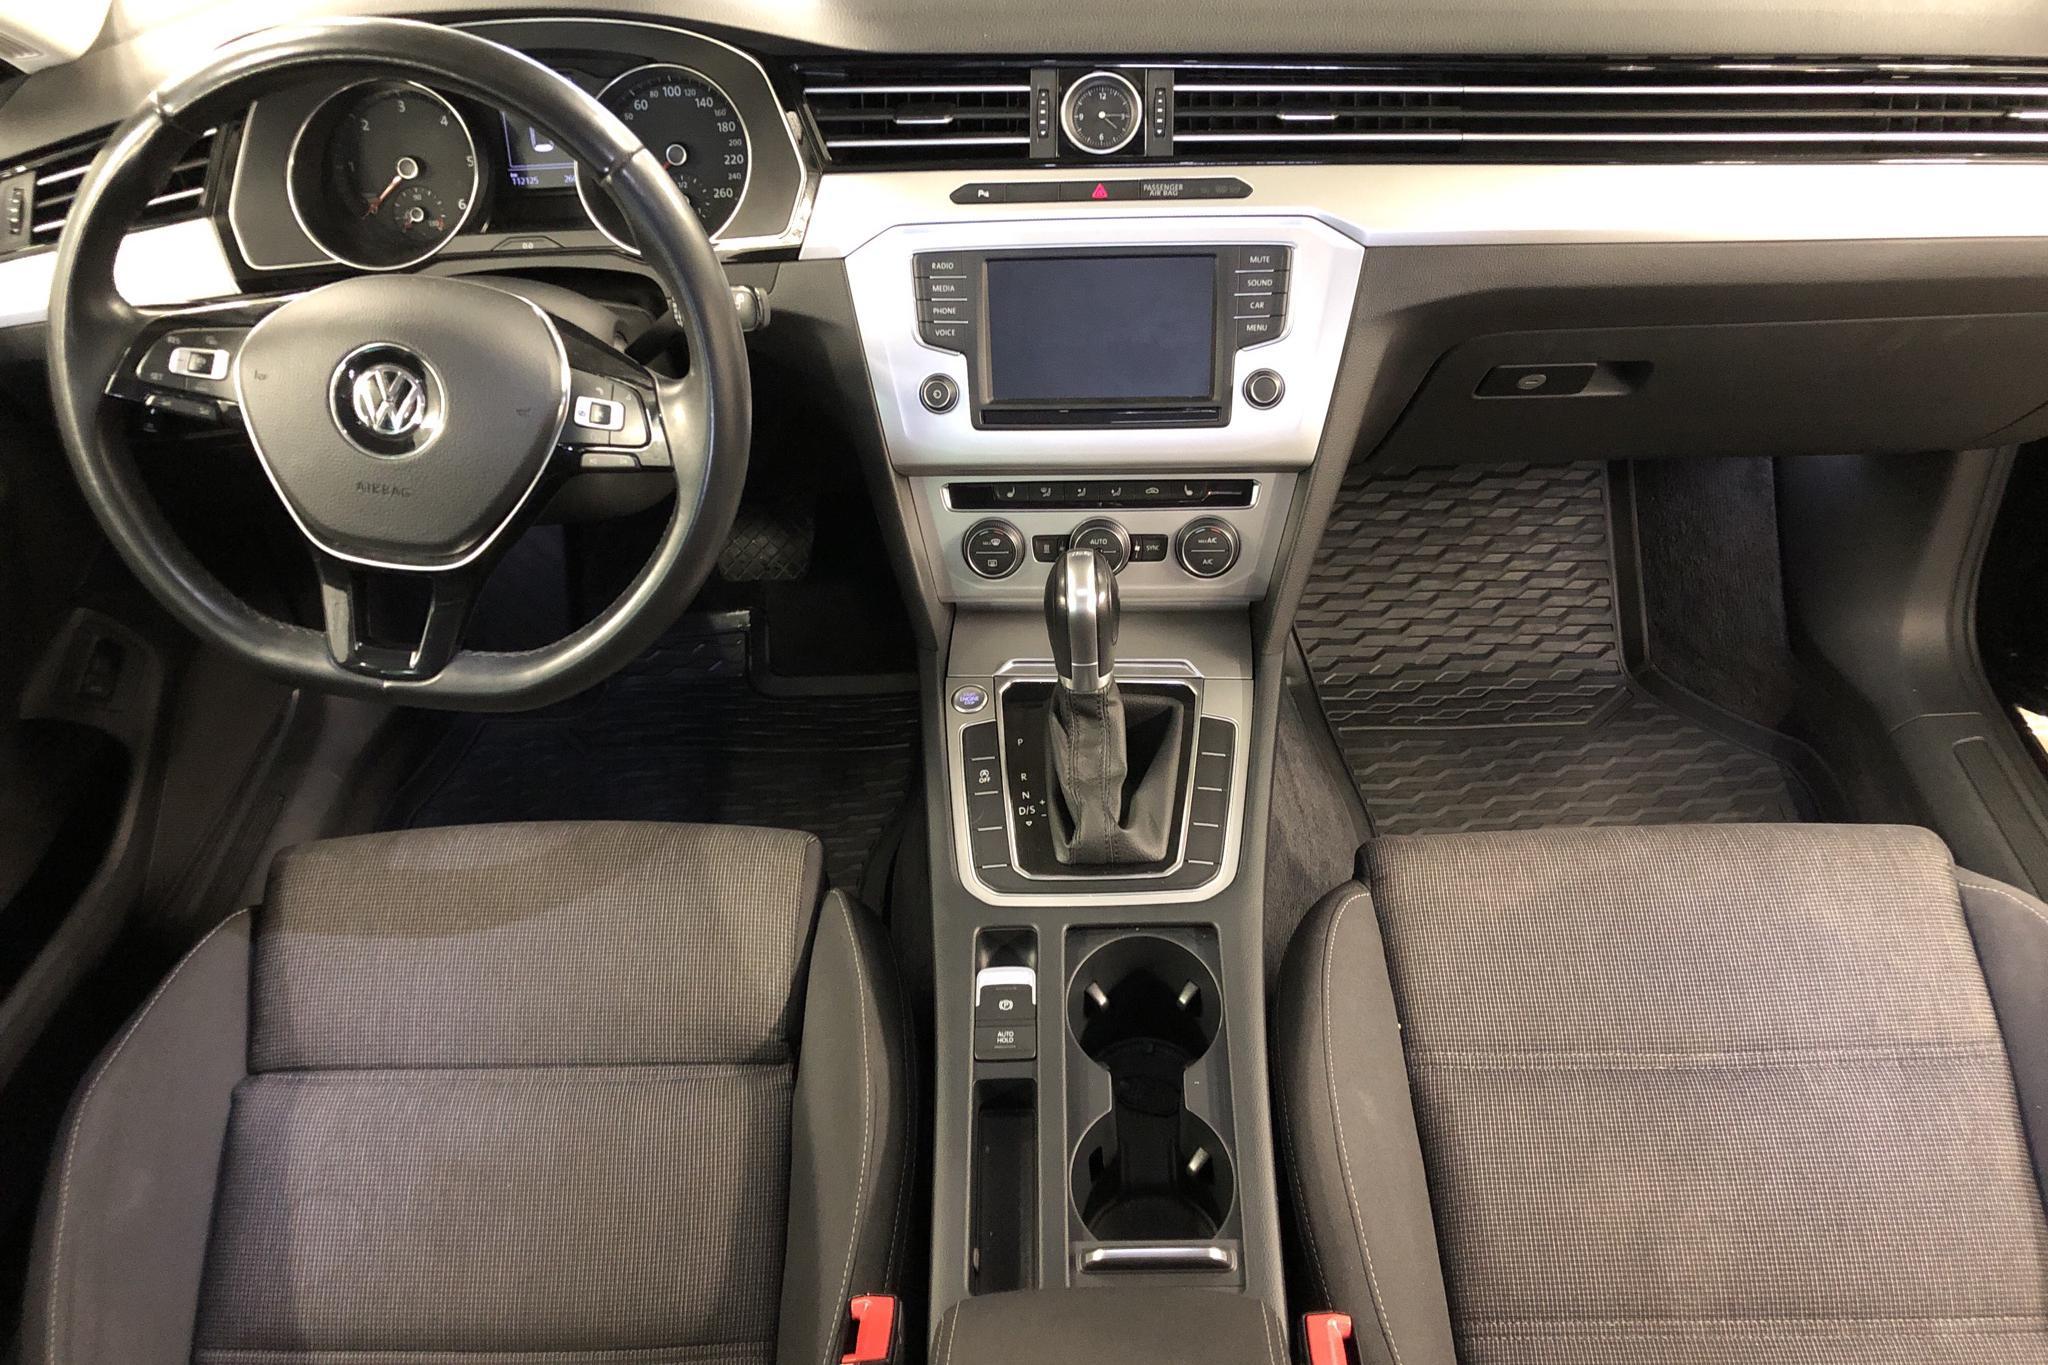 VW Passat 2.0 TDI Sportscombi (150hk) - 112 130 km - Automatic - black - 2015